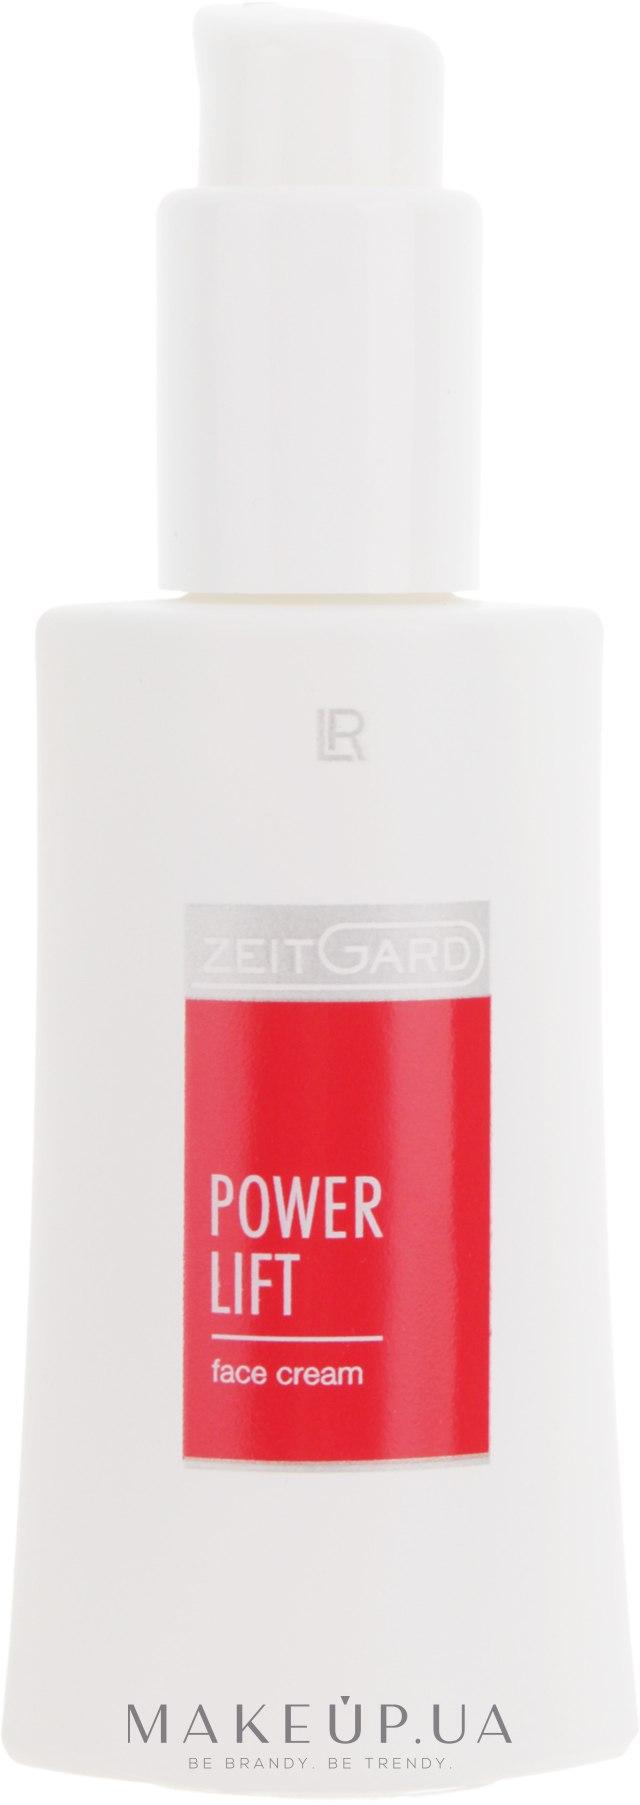 MAKEUP | Крем для лица - LR Health & <b>Beauty</b> Zeitgard Power ...